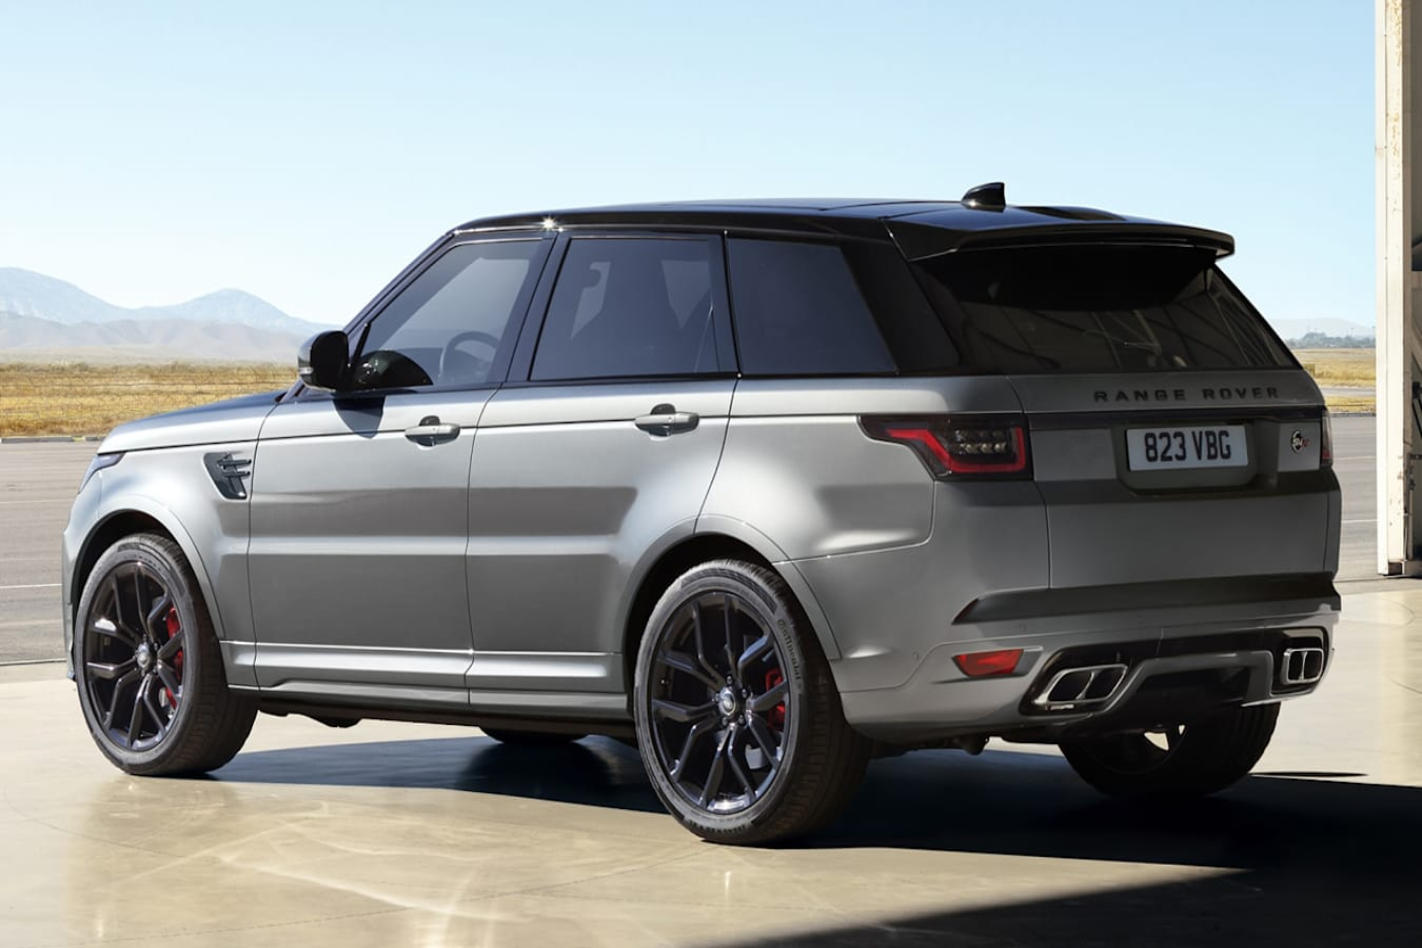 2020 Range Rover Sport SVR Carbon Edition